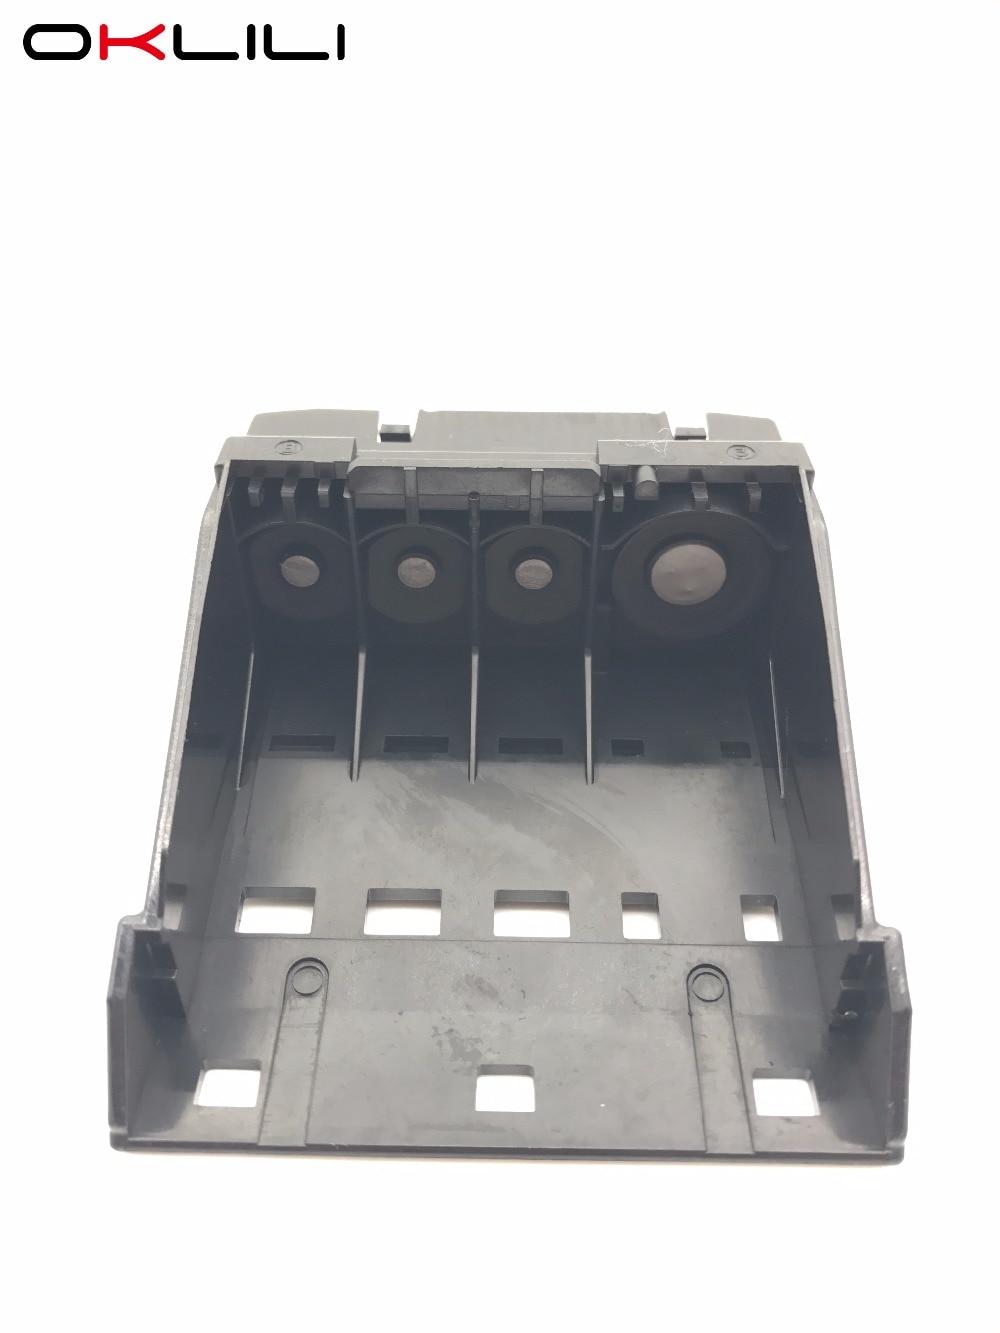 OKLILI QY6-0042 Printhead Print Head Printer Head for Canon iX4000 iX5000 iP3100 iP3000 560i 850i MP700 MP710 MP730 MP740<br>